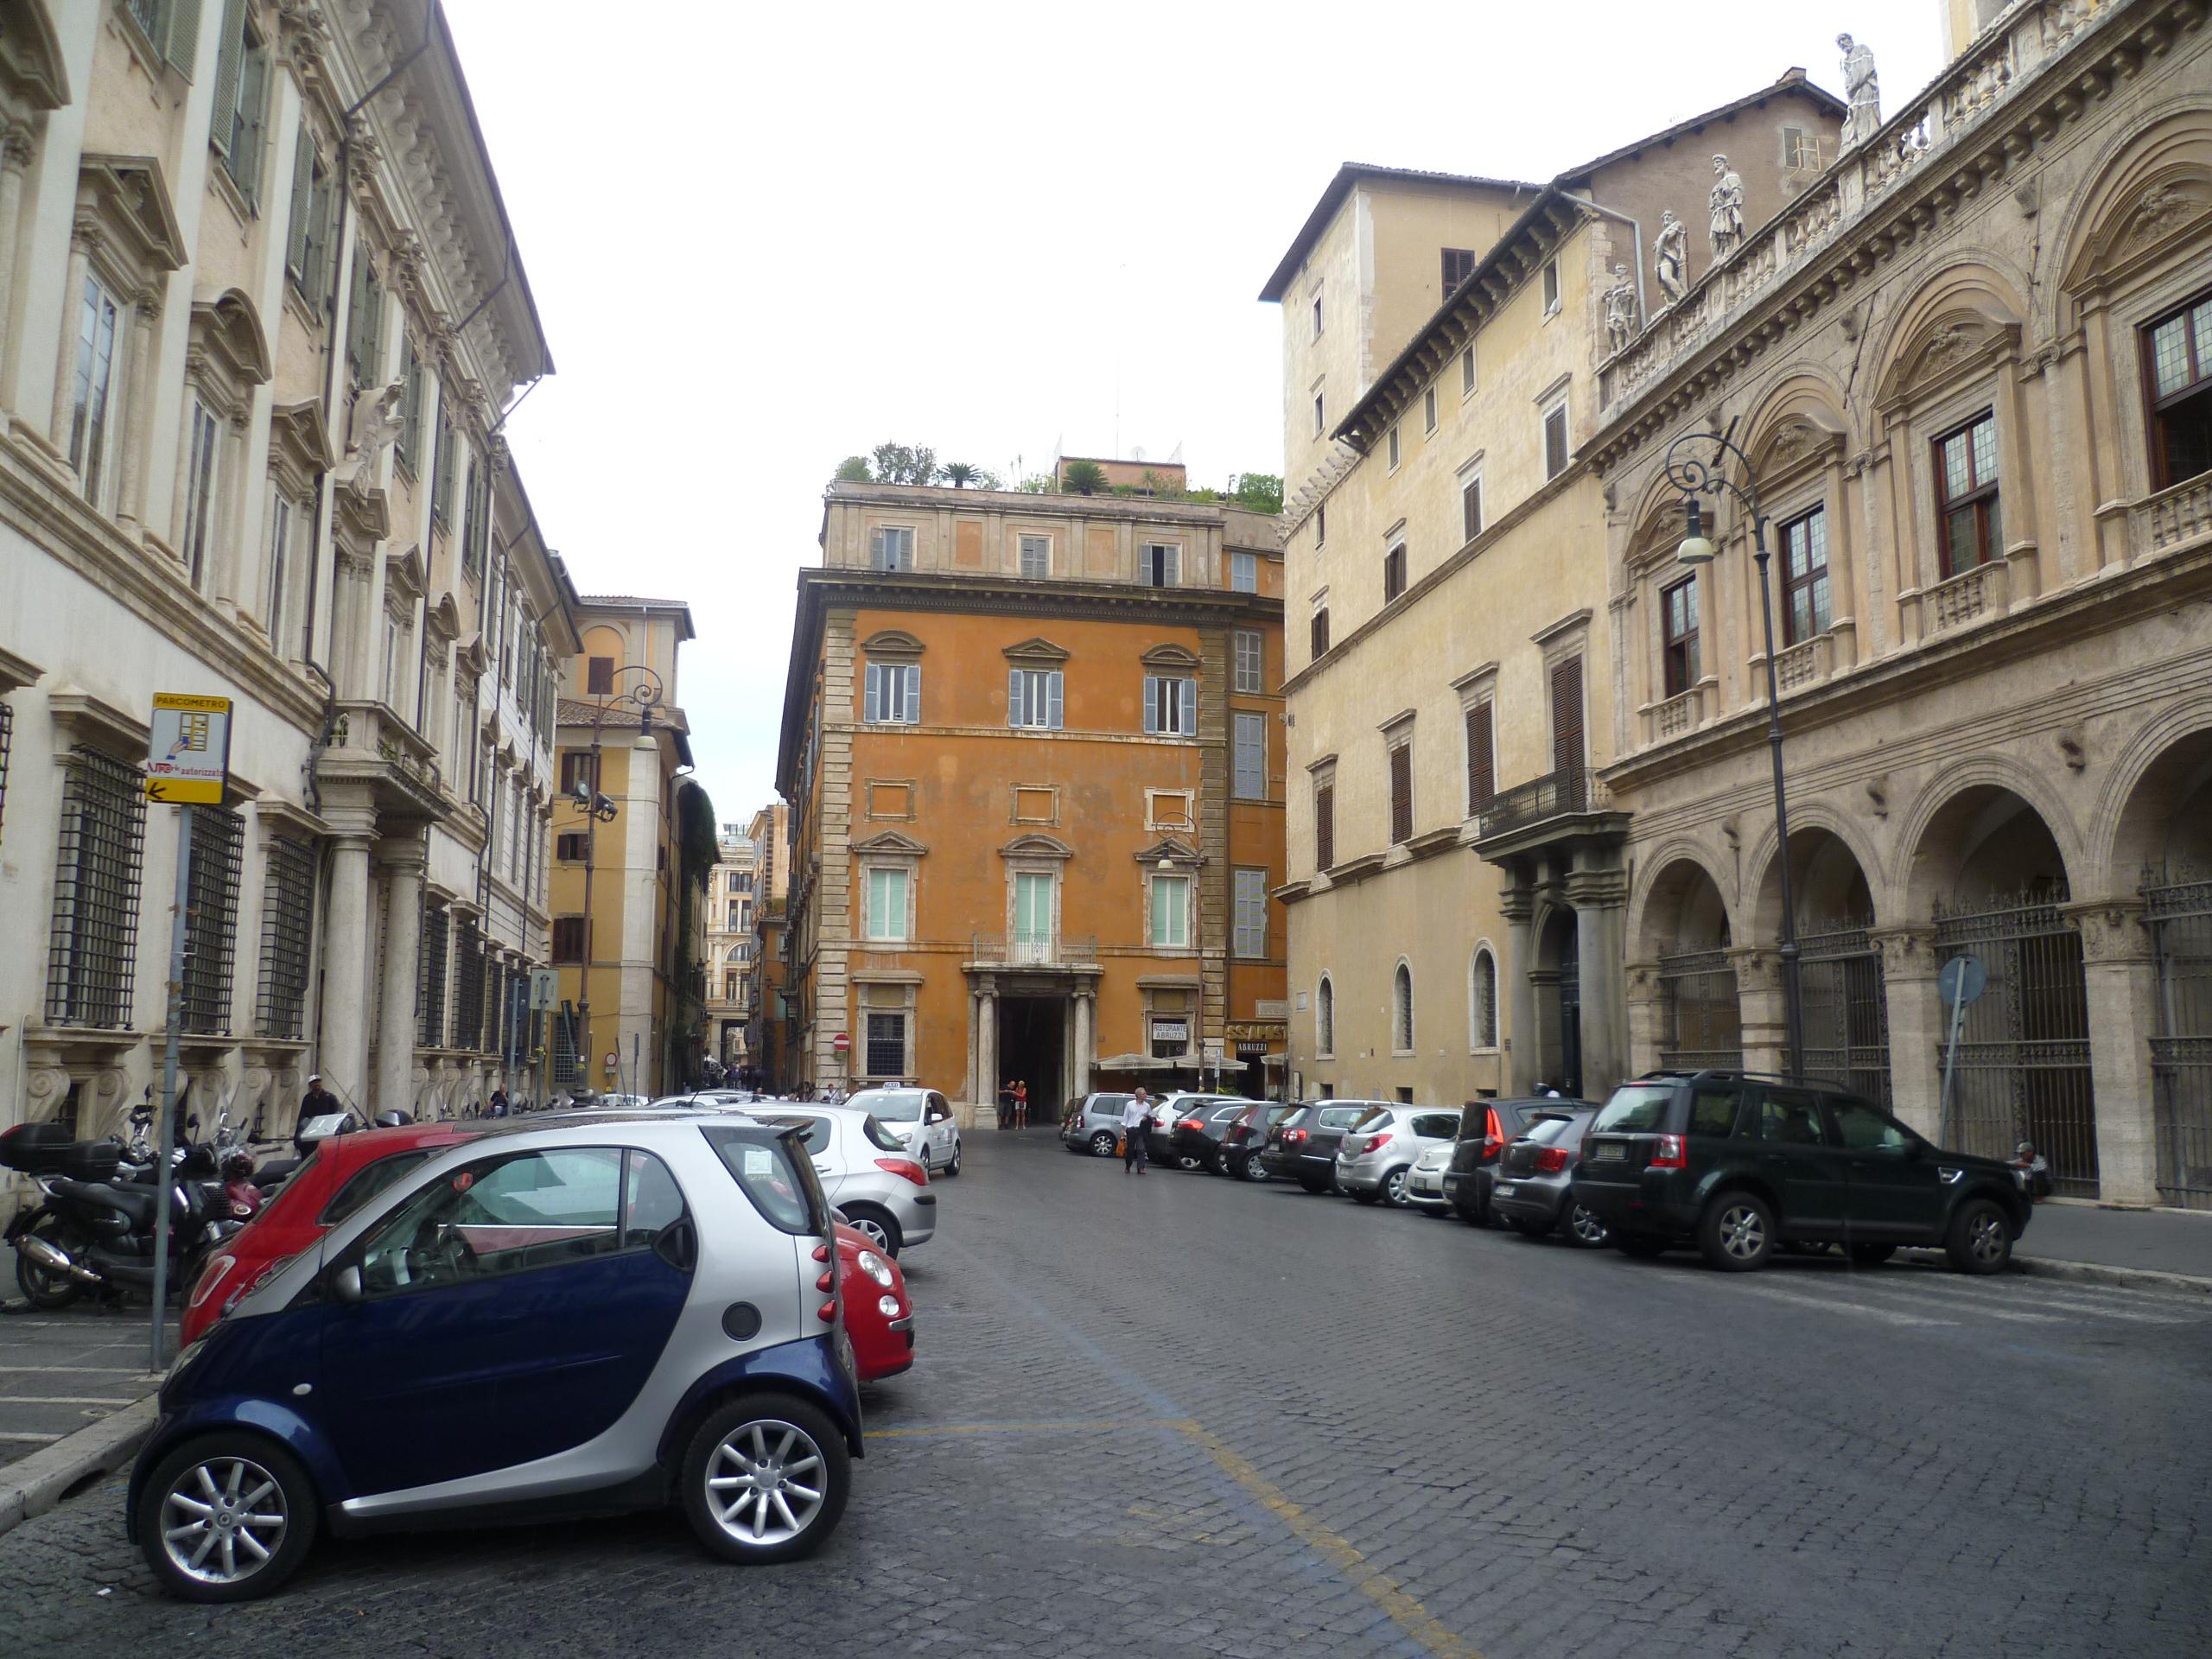 Piazza Santi Apostoli in Rome